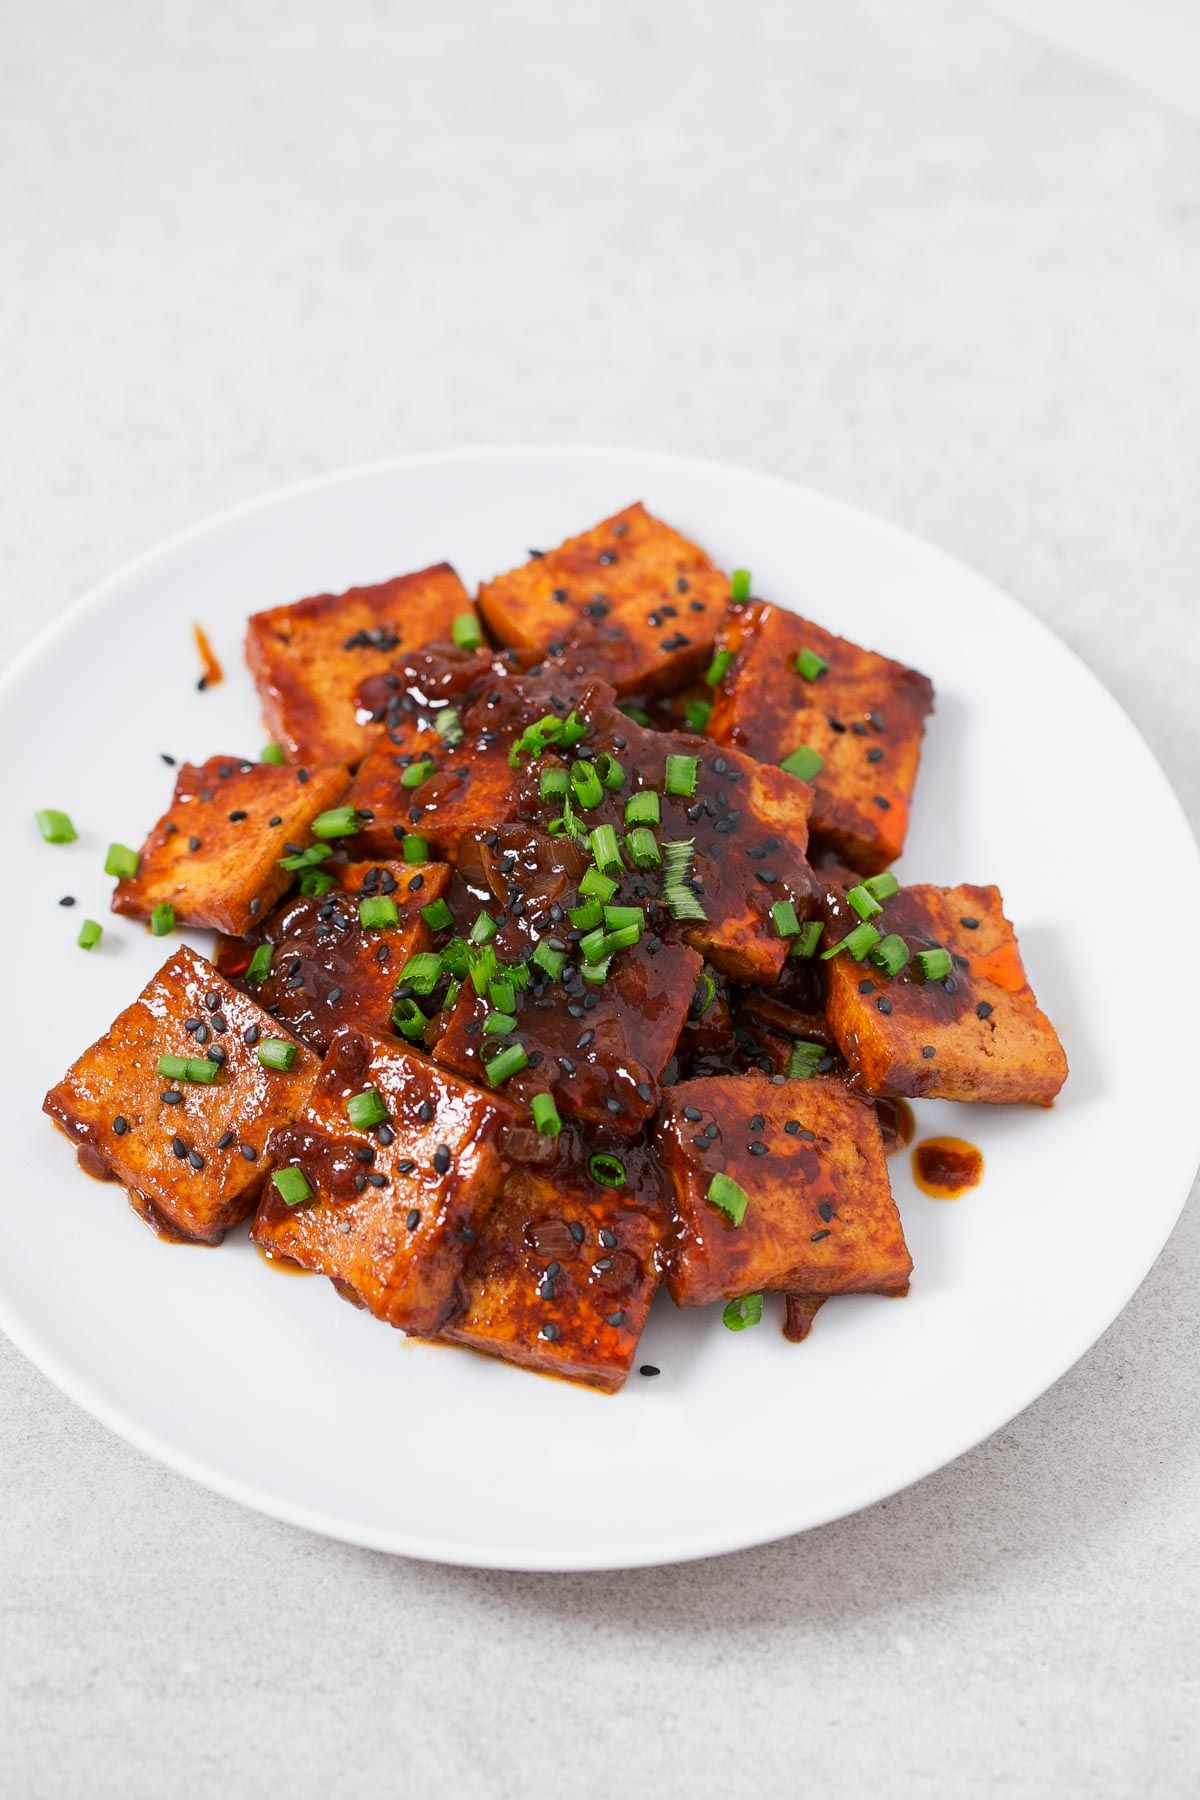 Korean style spicy tofu recipe korean cuisine tofu and veggies korean style spicy tofu vegan tofu recipesspicy recipeskorean food forumfinder Image collections